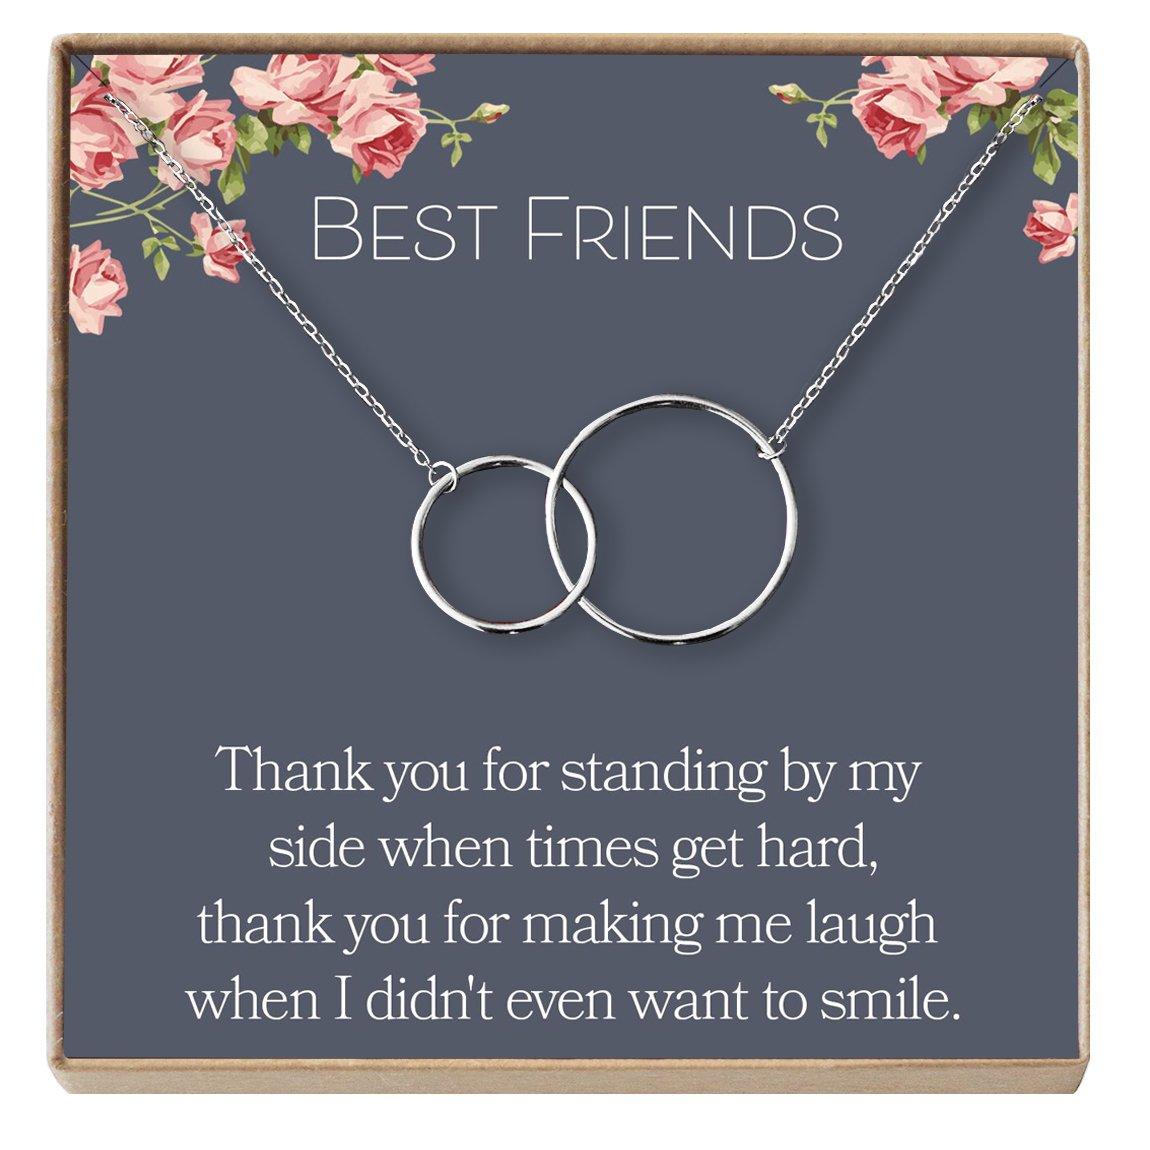 Buy Dear Ava Best Friend Necklace: BFF Necklace, Jewelry ...